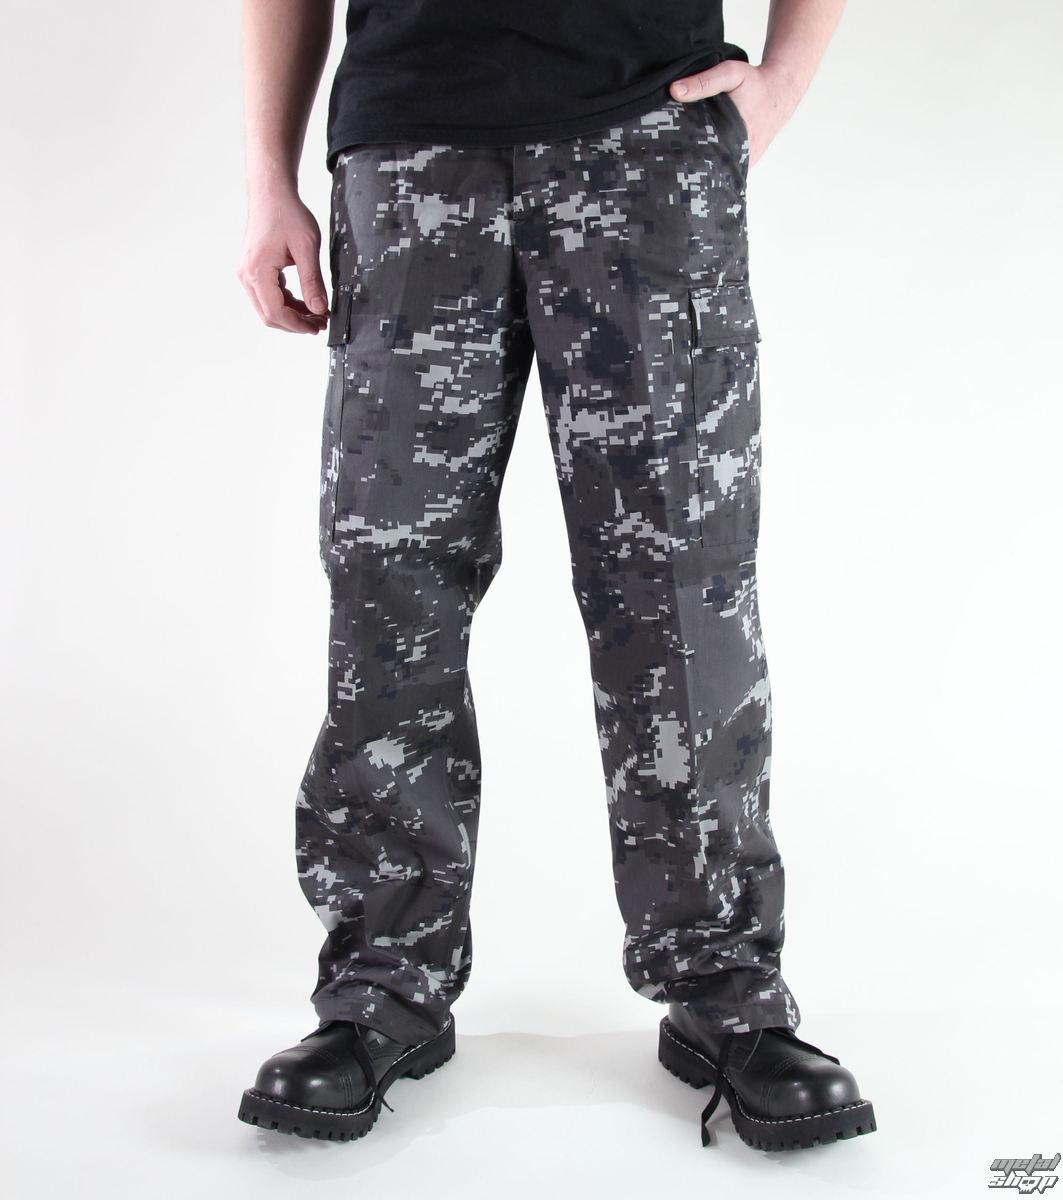 kalhoty pánské MIL-TEC - US Ranger Hose - Black Digital - 11810076